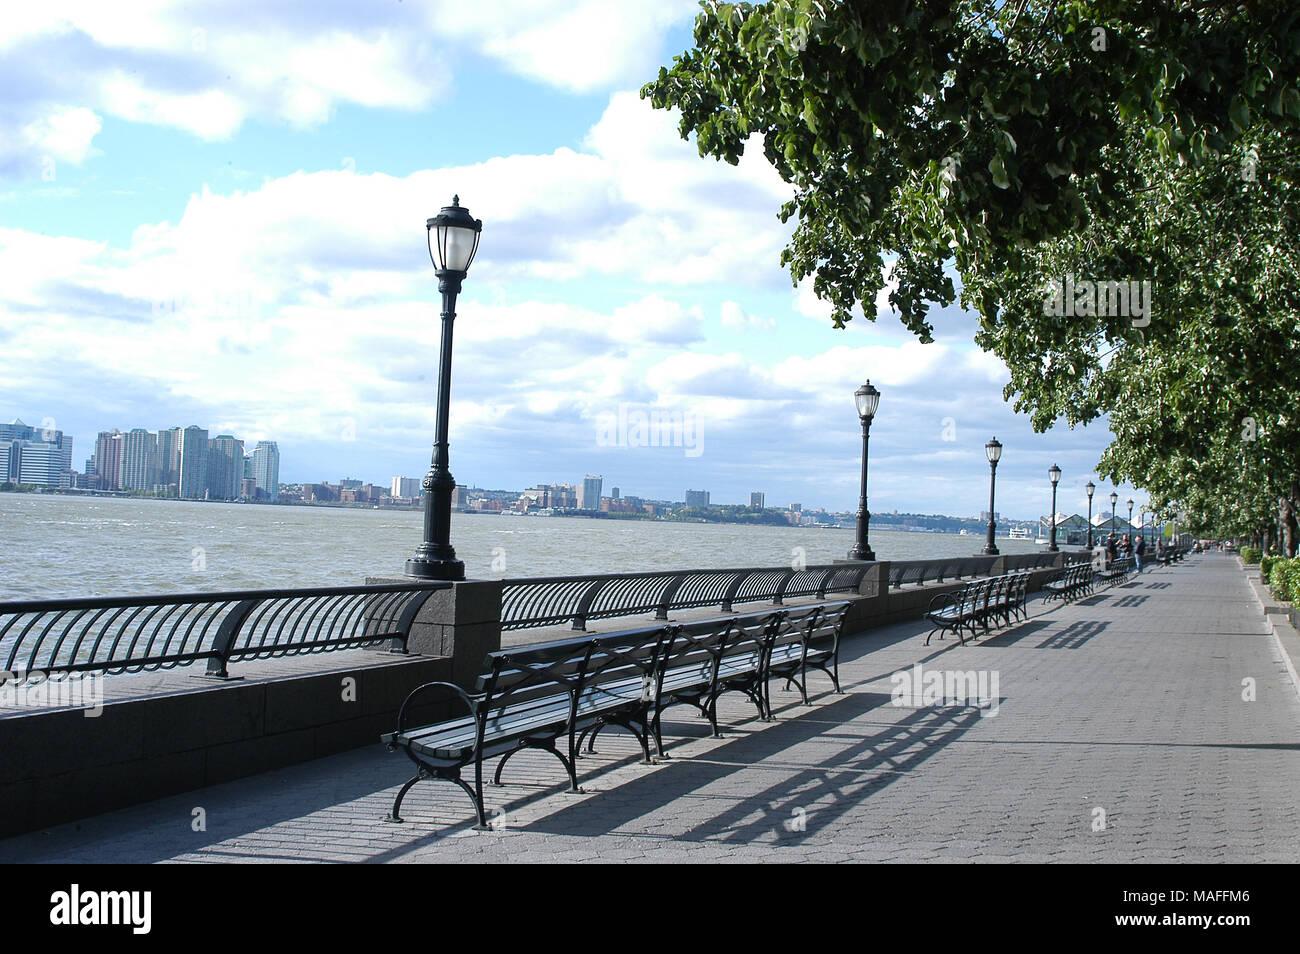 New-York Lifestyle Stock Photo